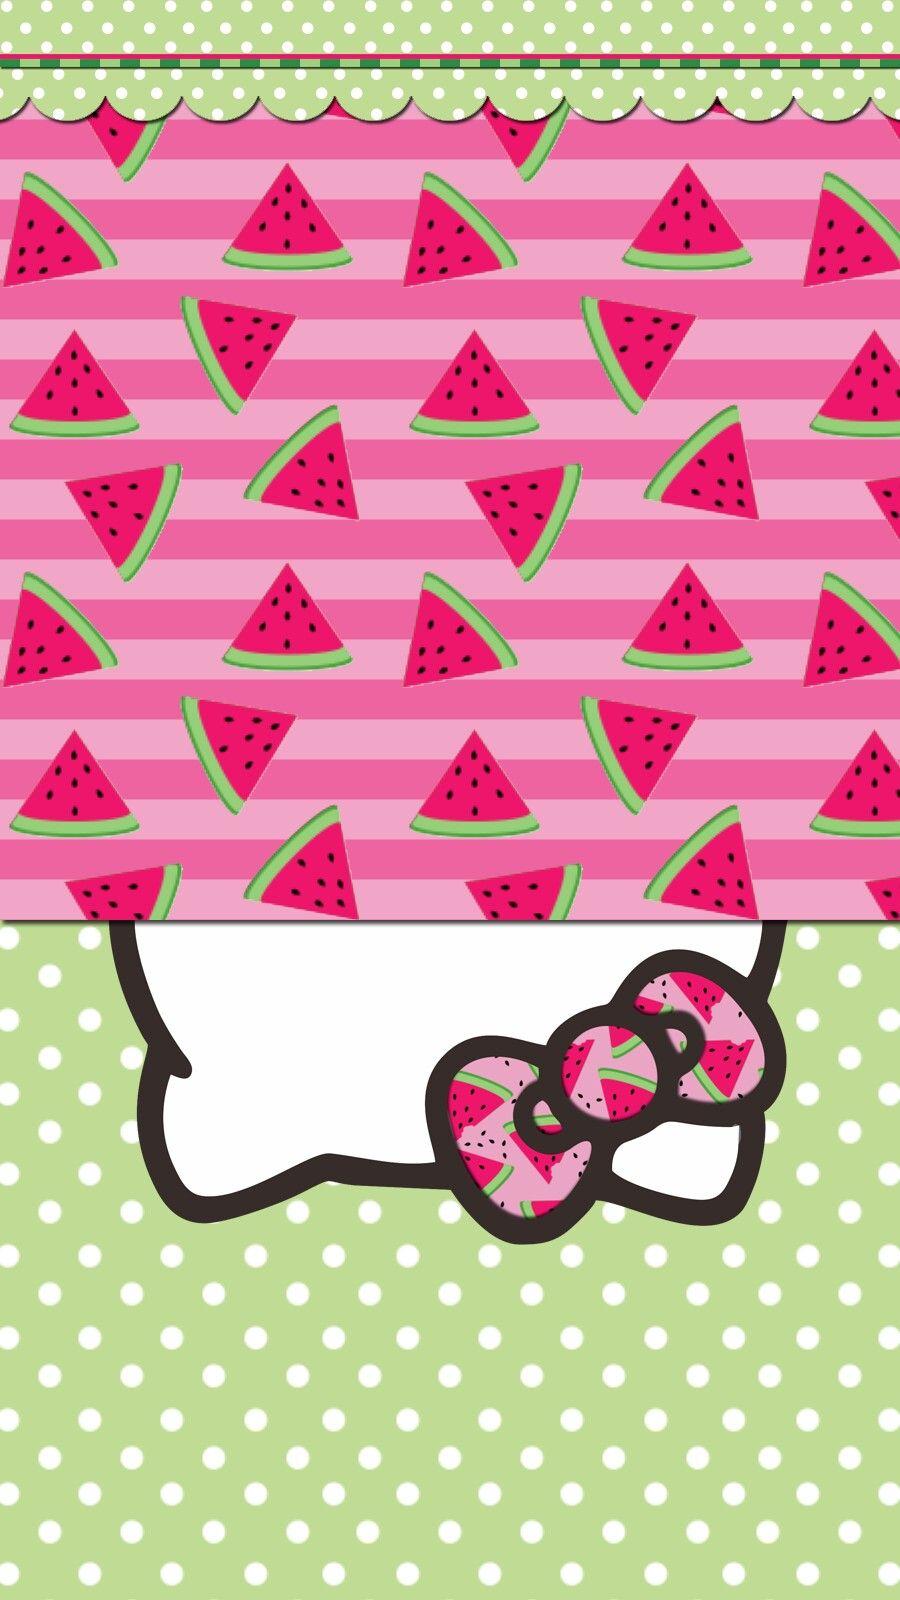 Popular Wallpaper Hello Kitty Vintage - 490aa17f12cc3798aa83056c092a9c5b  Image_80713.jpg